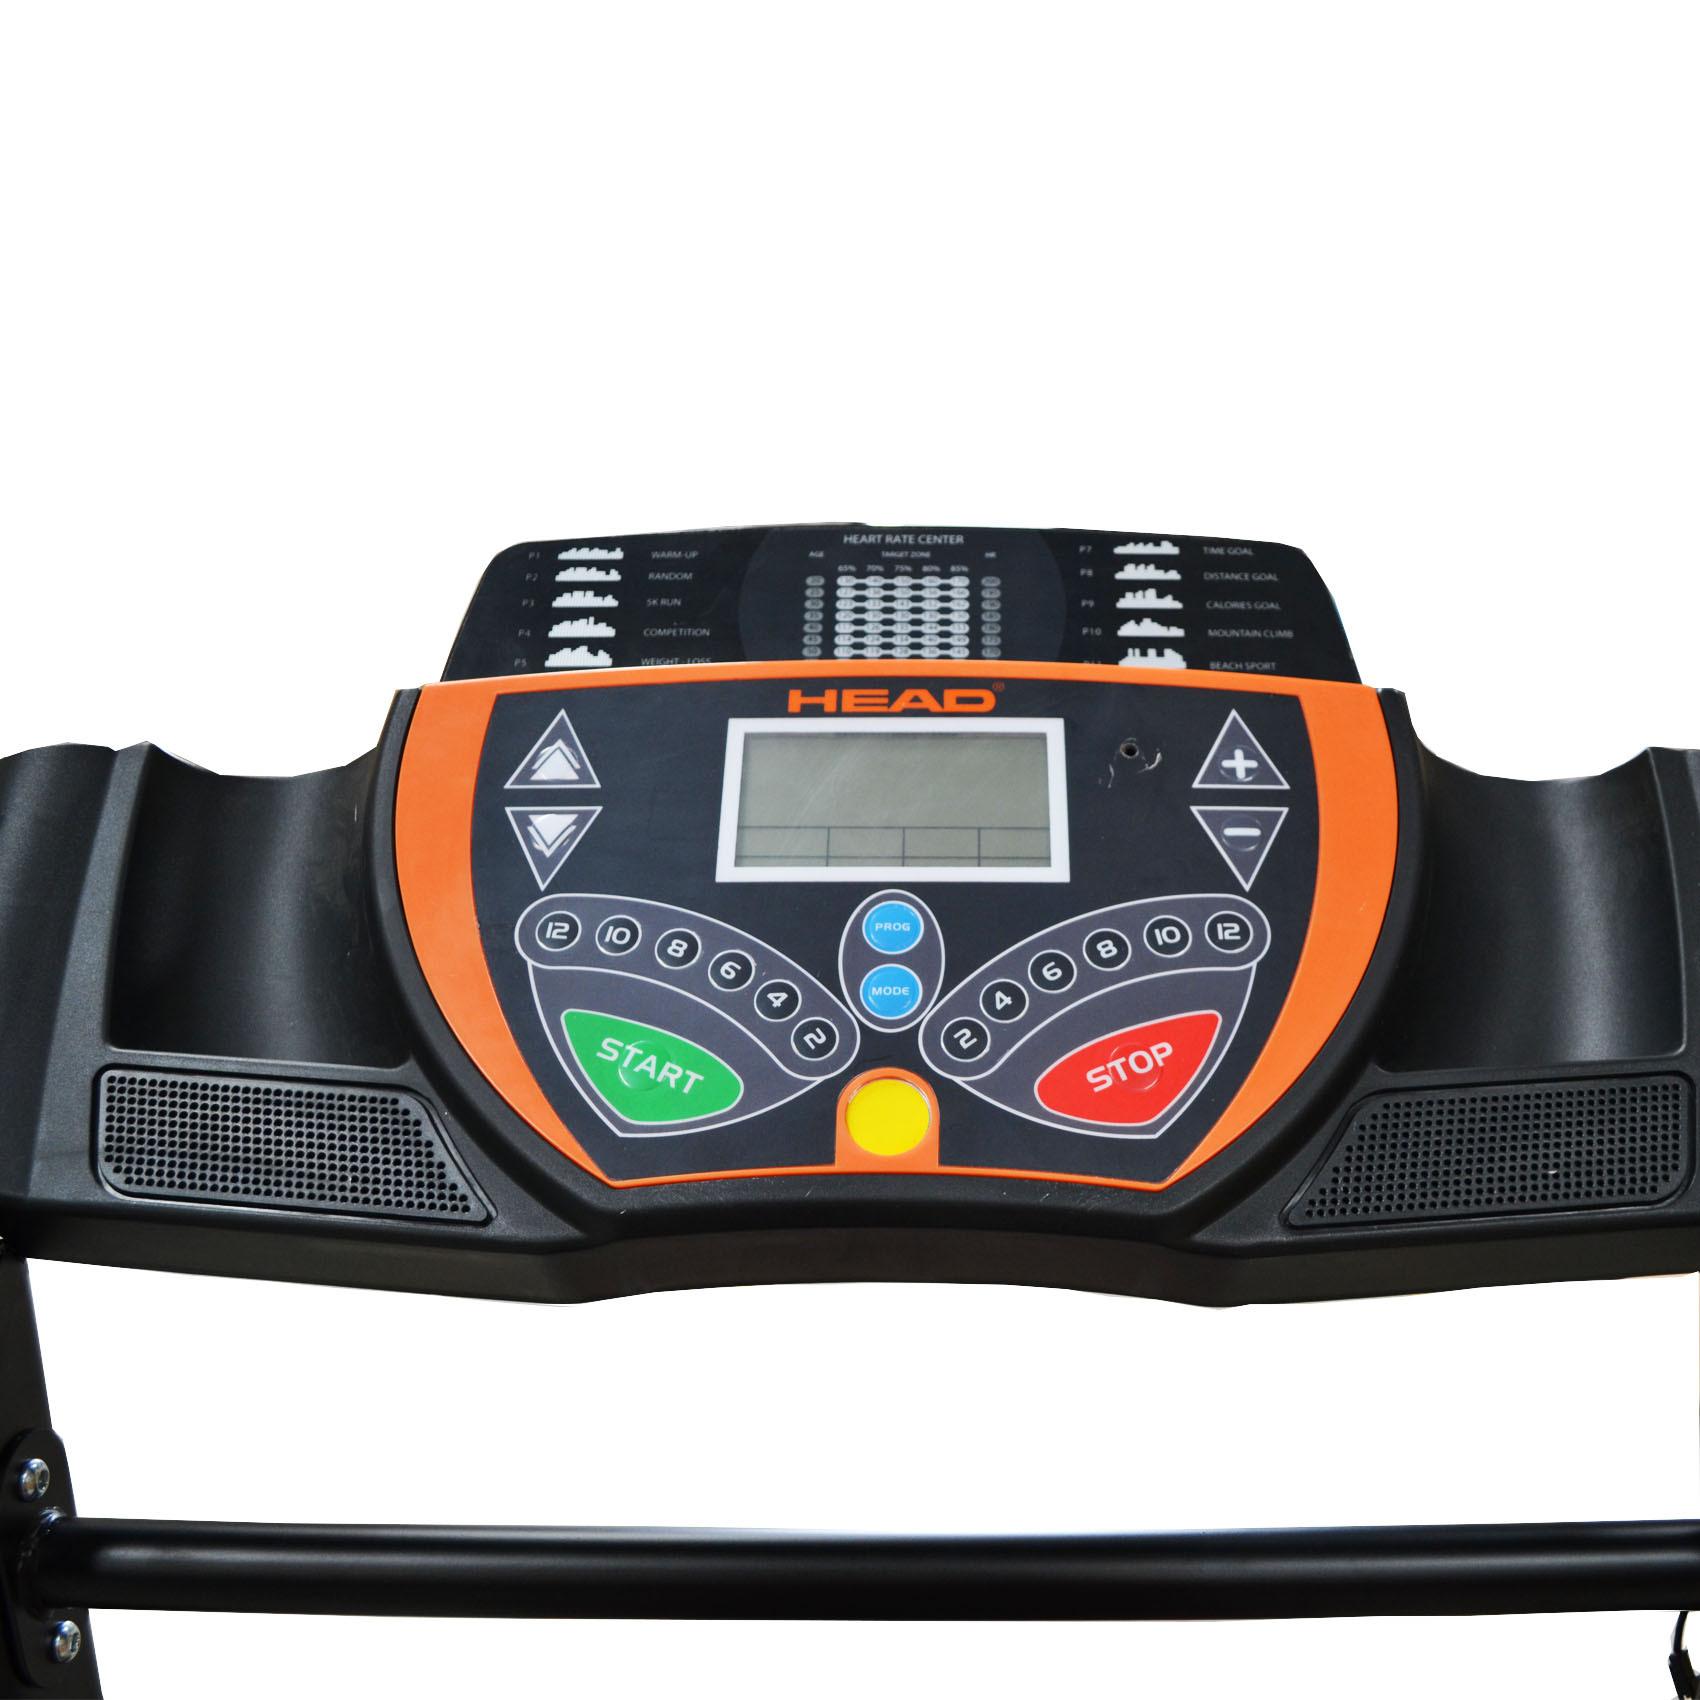 HEAD TREADMILL W/ AUTO INCLINE 2HP